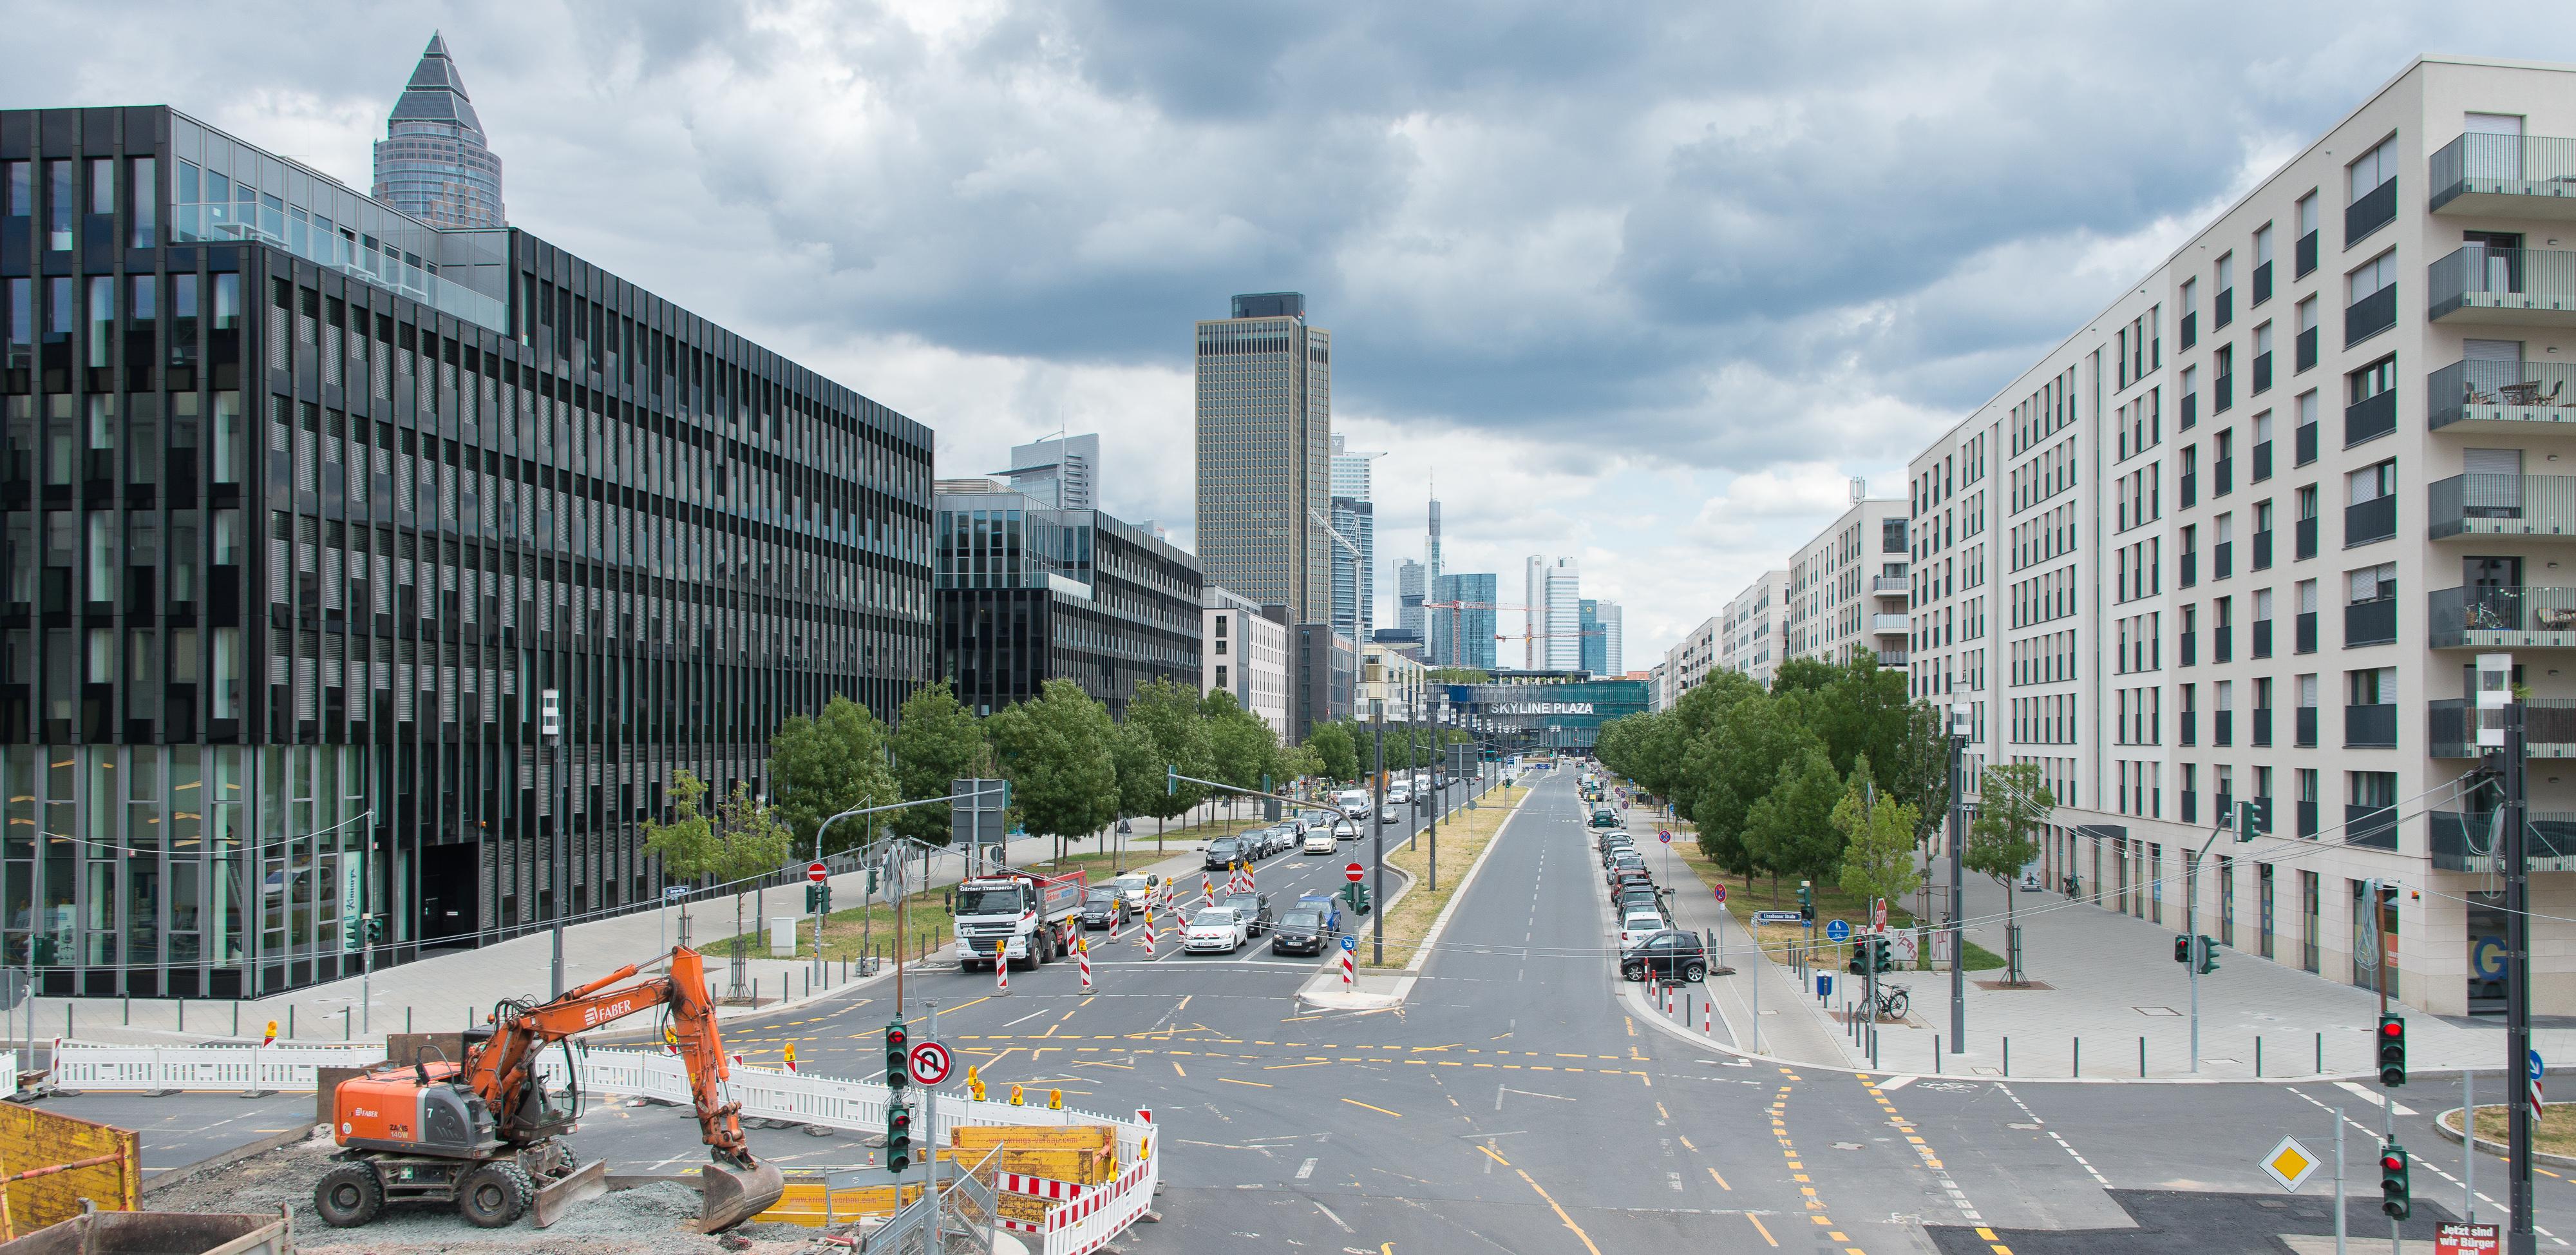 Europaviertel Frankfurt am Main  Wikiwand